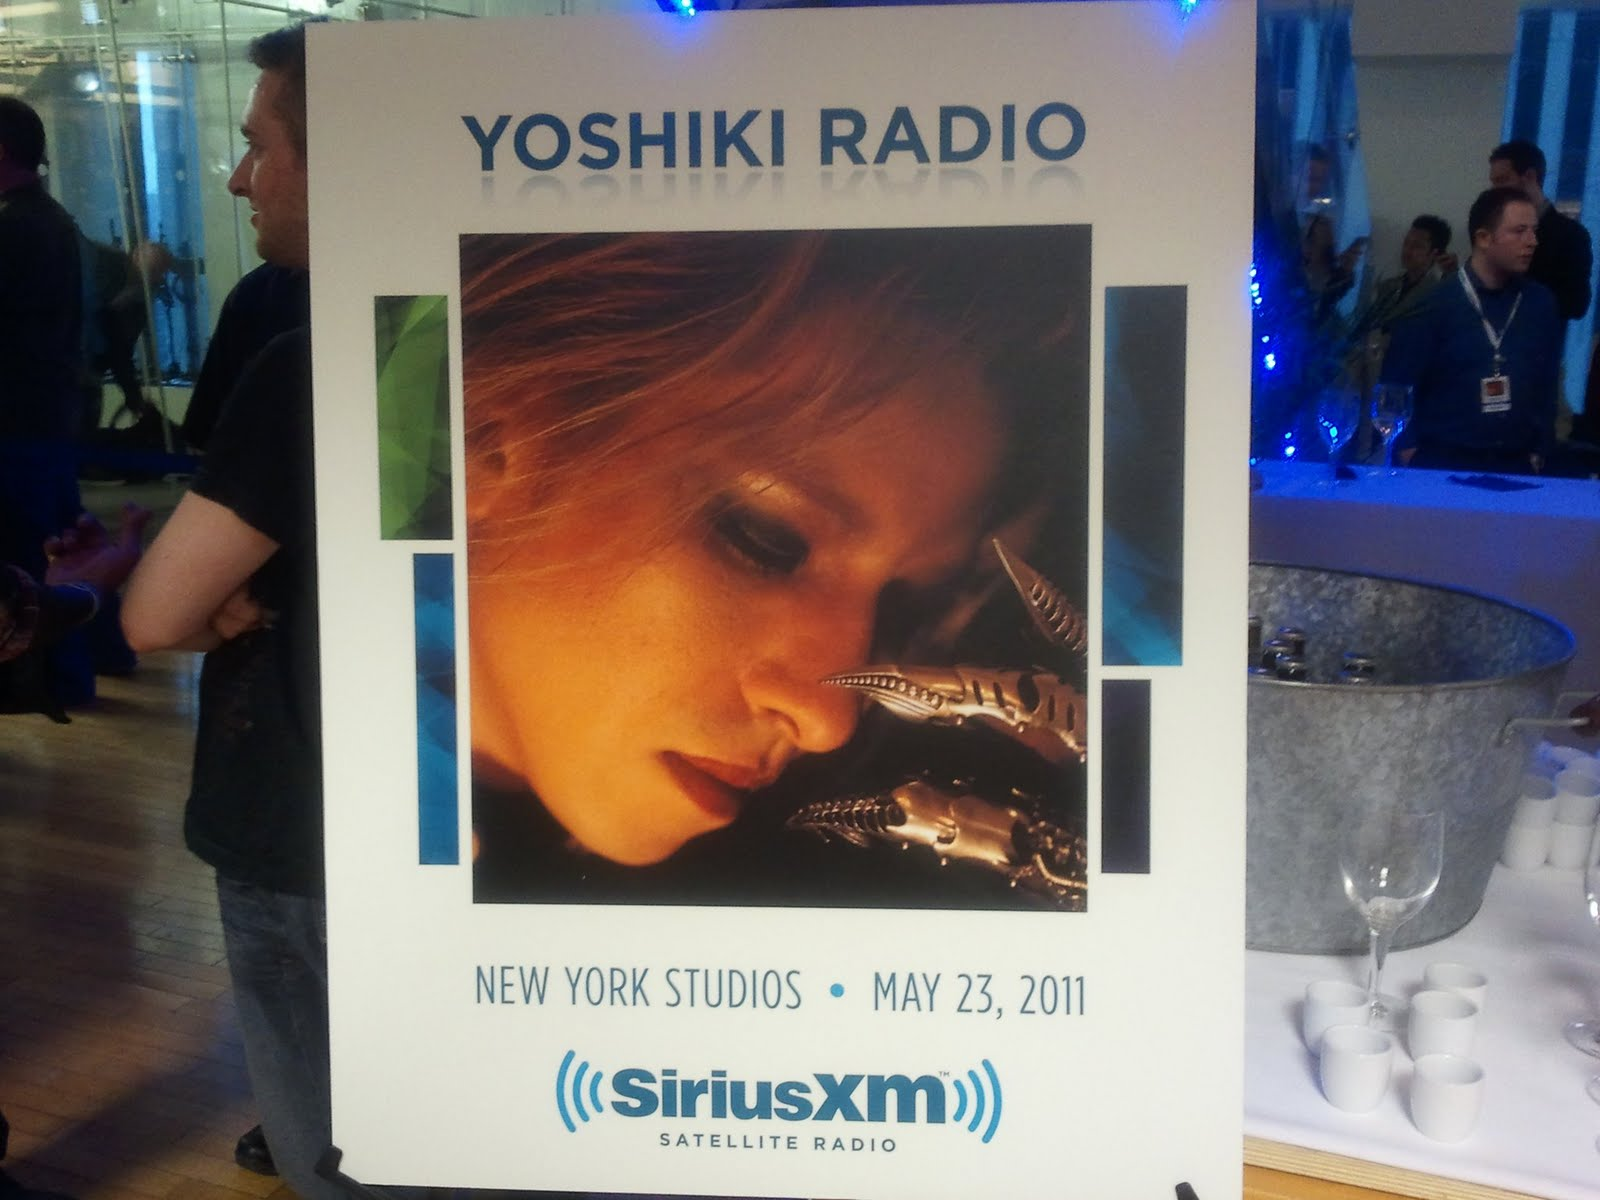 X-Japan's Yoshiki Hayashi